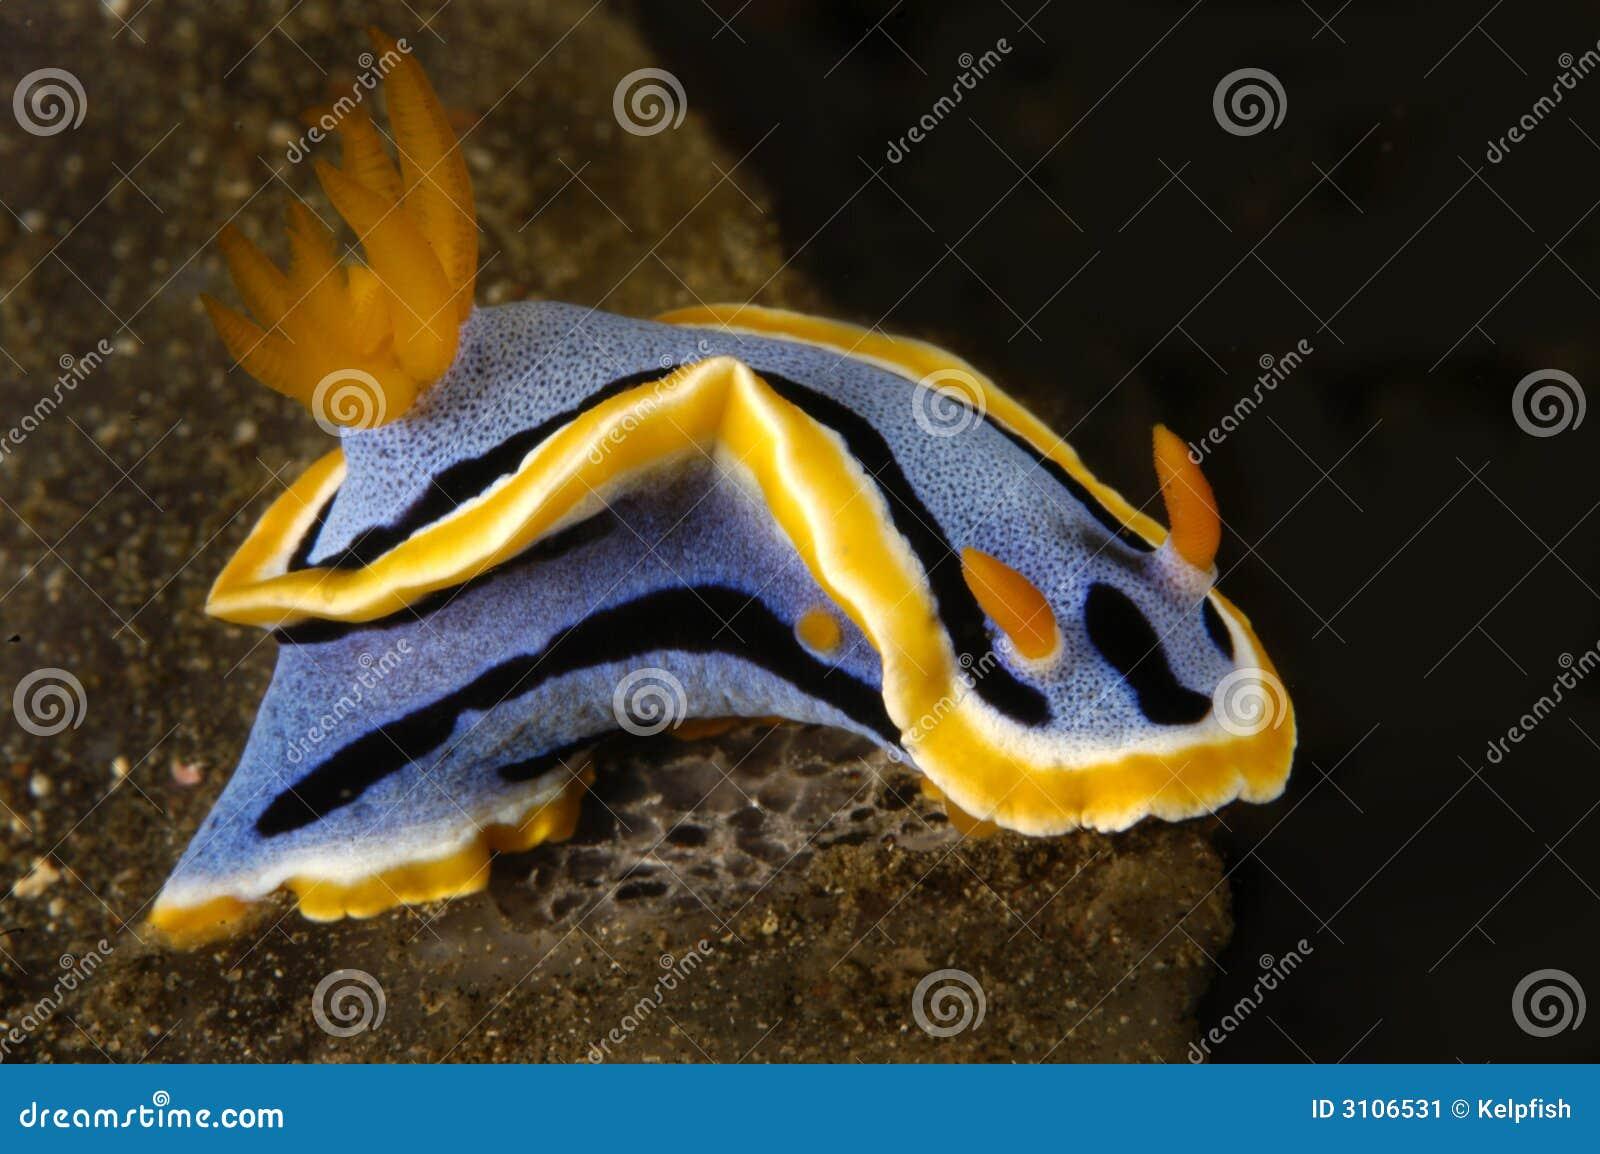 Nudibranch snail